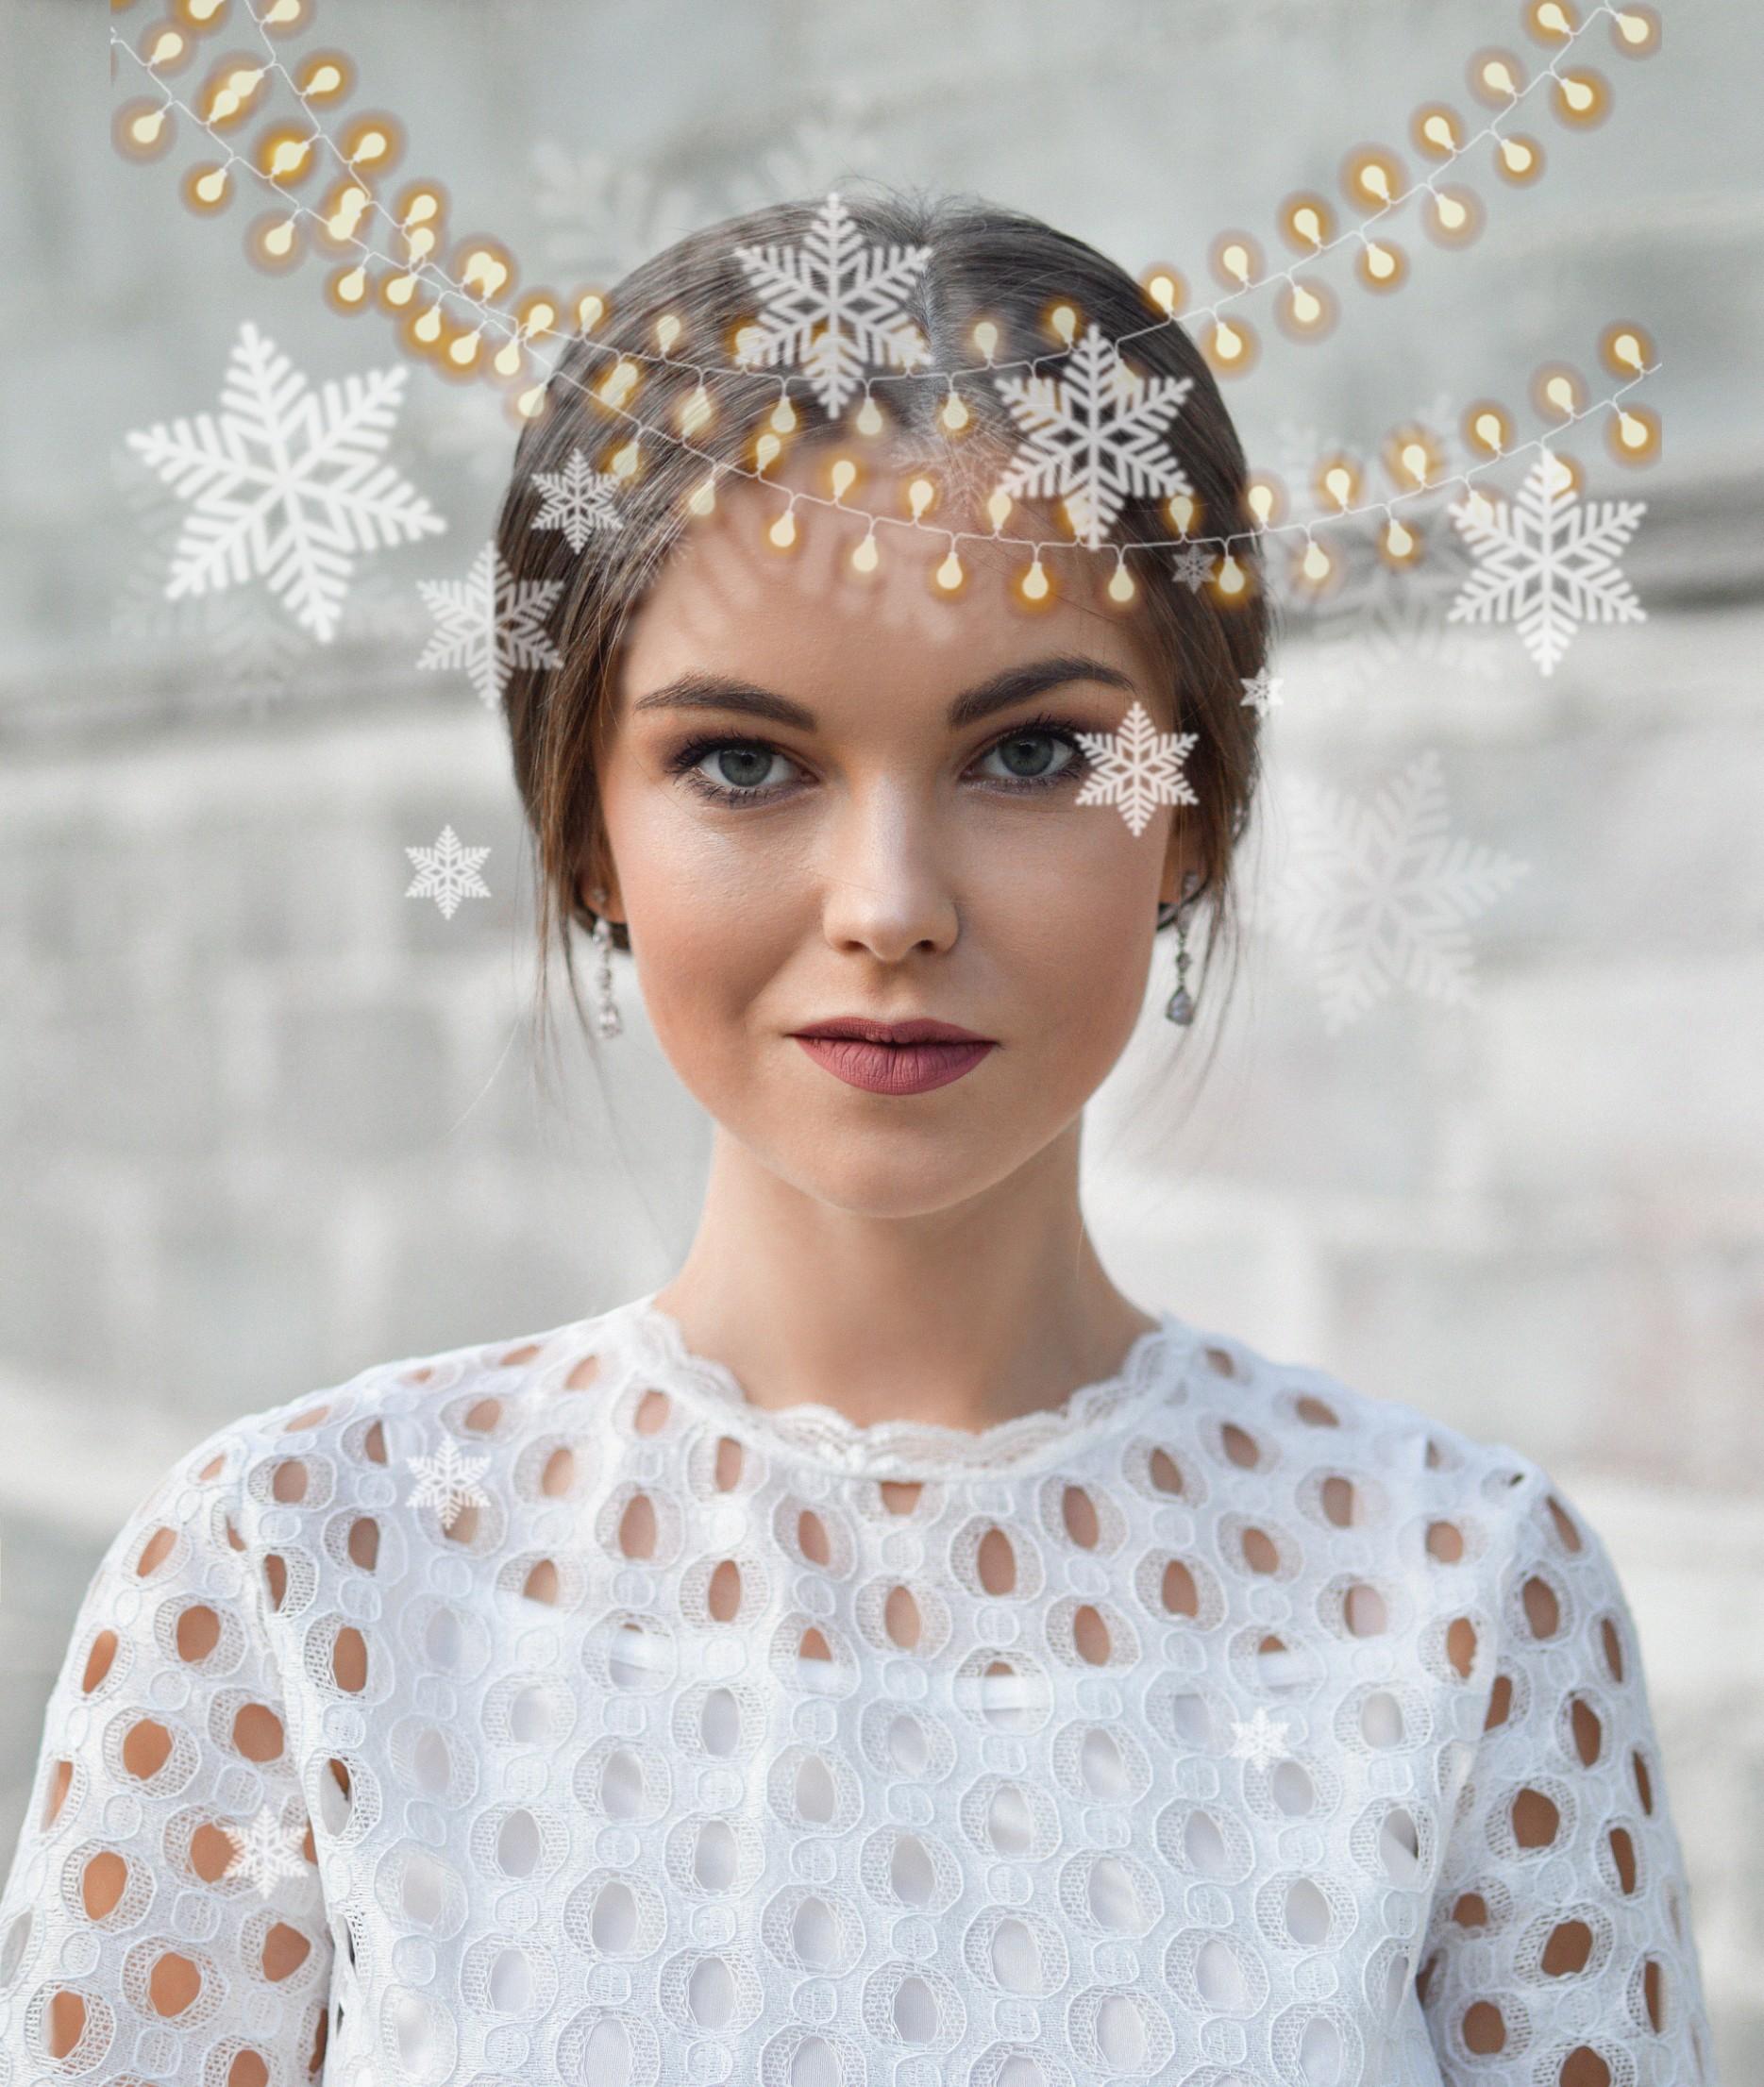 #freetoedit #winter #holidays #christmas #lights #snowflakes